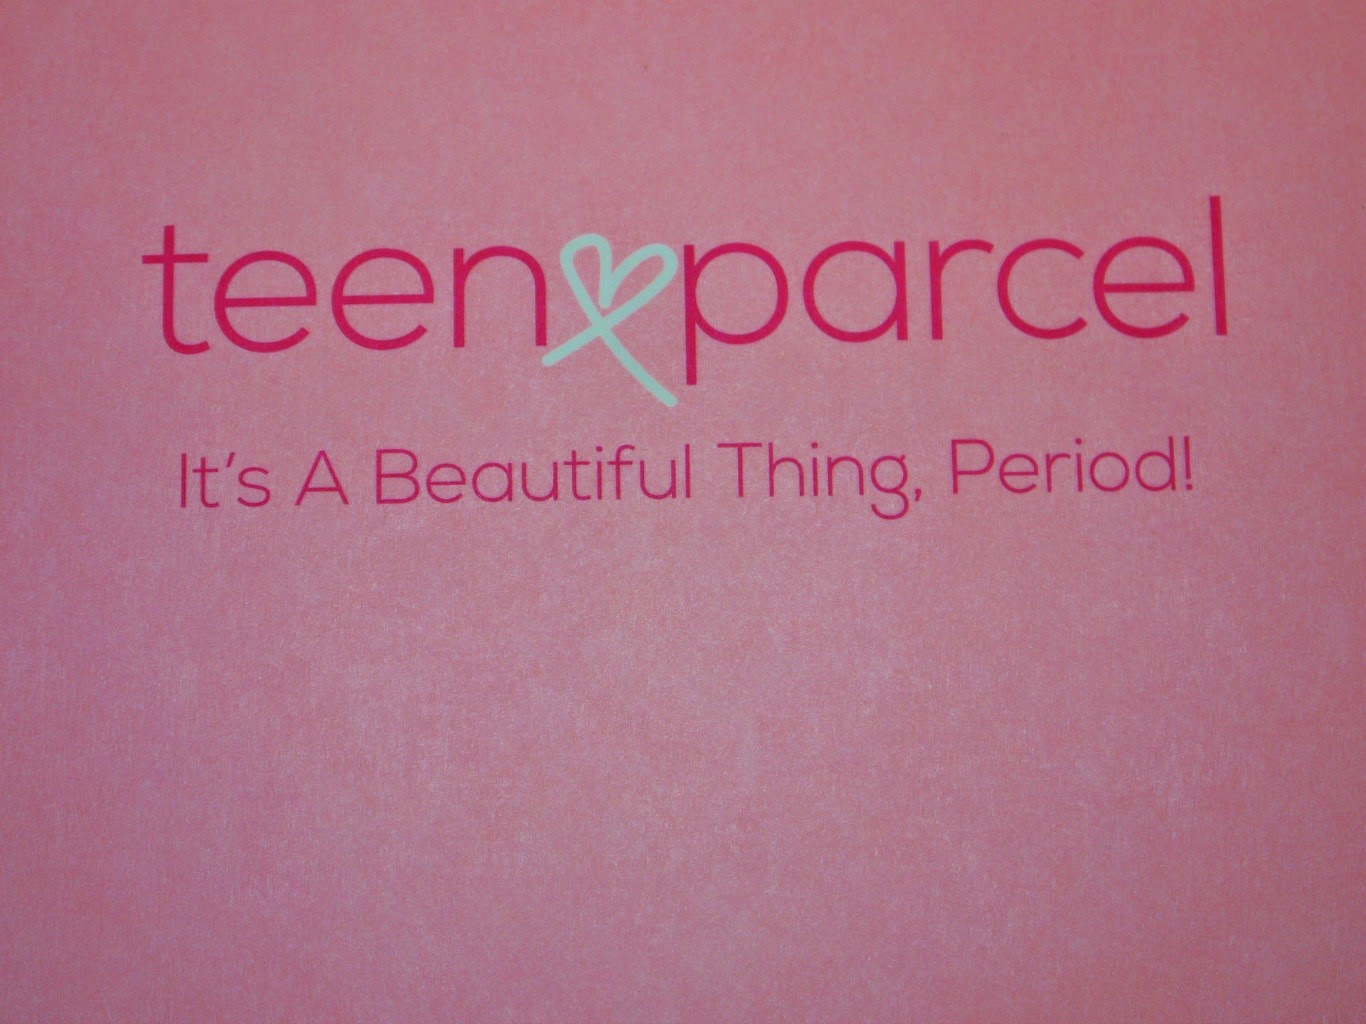 girls, periods